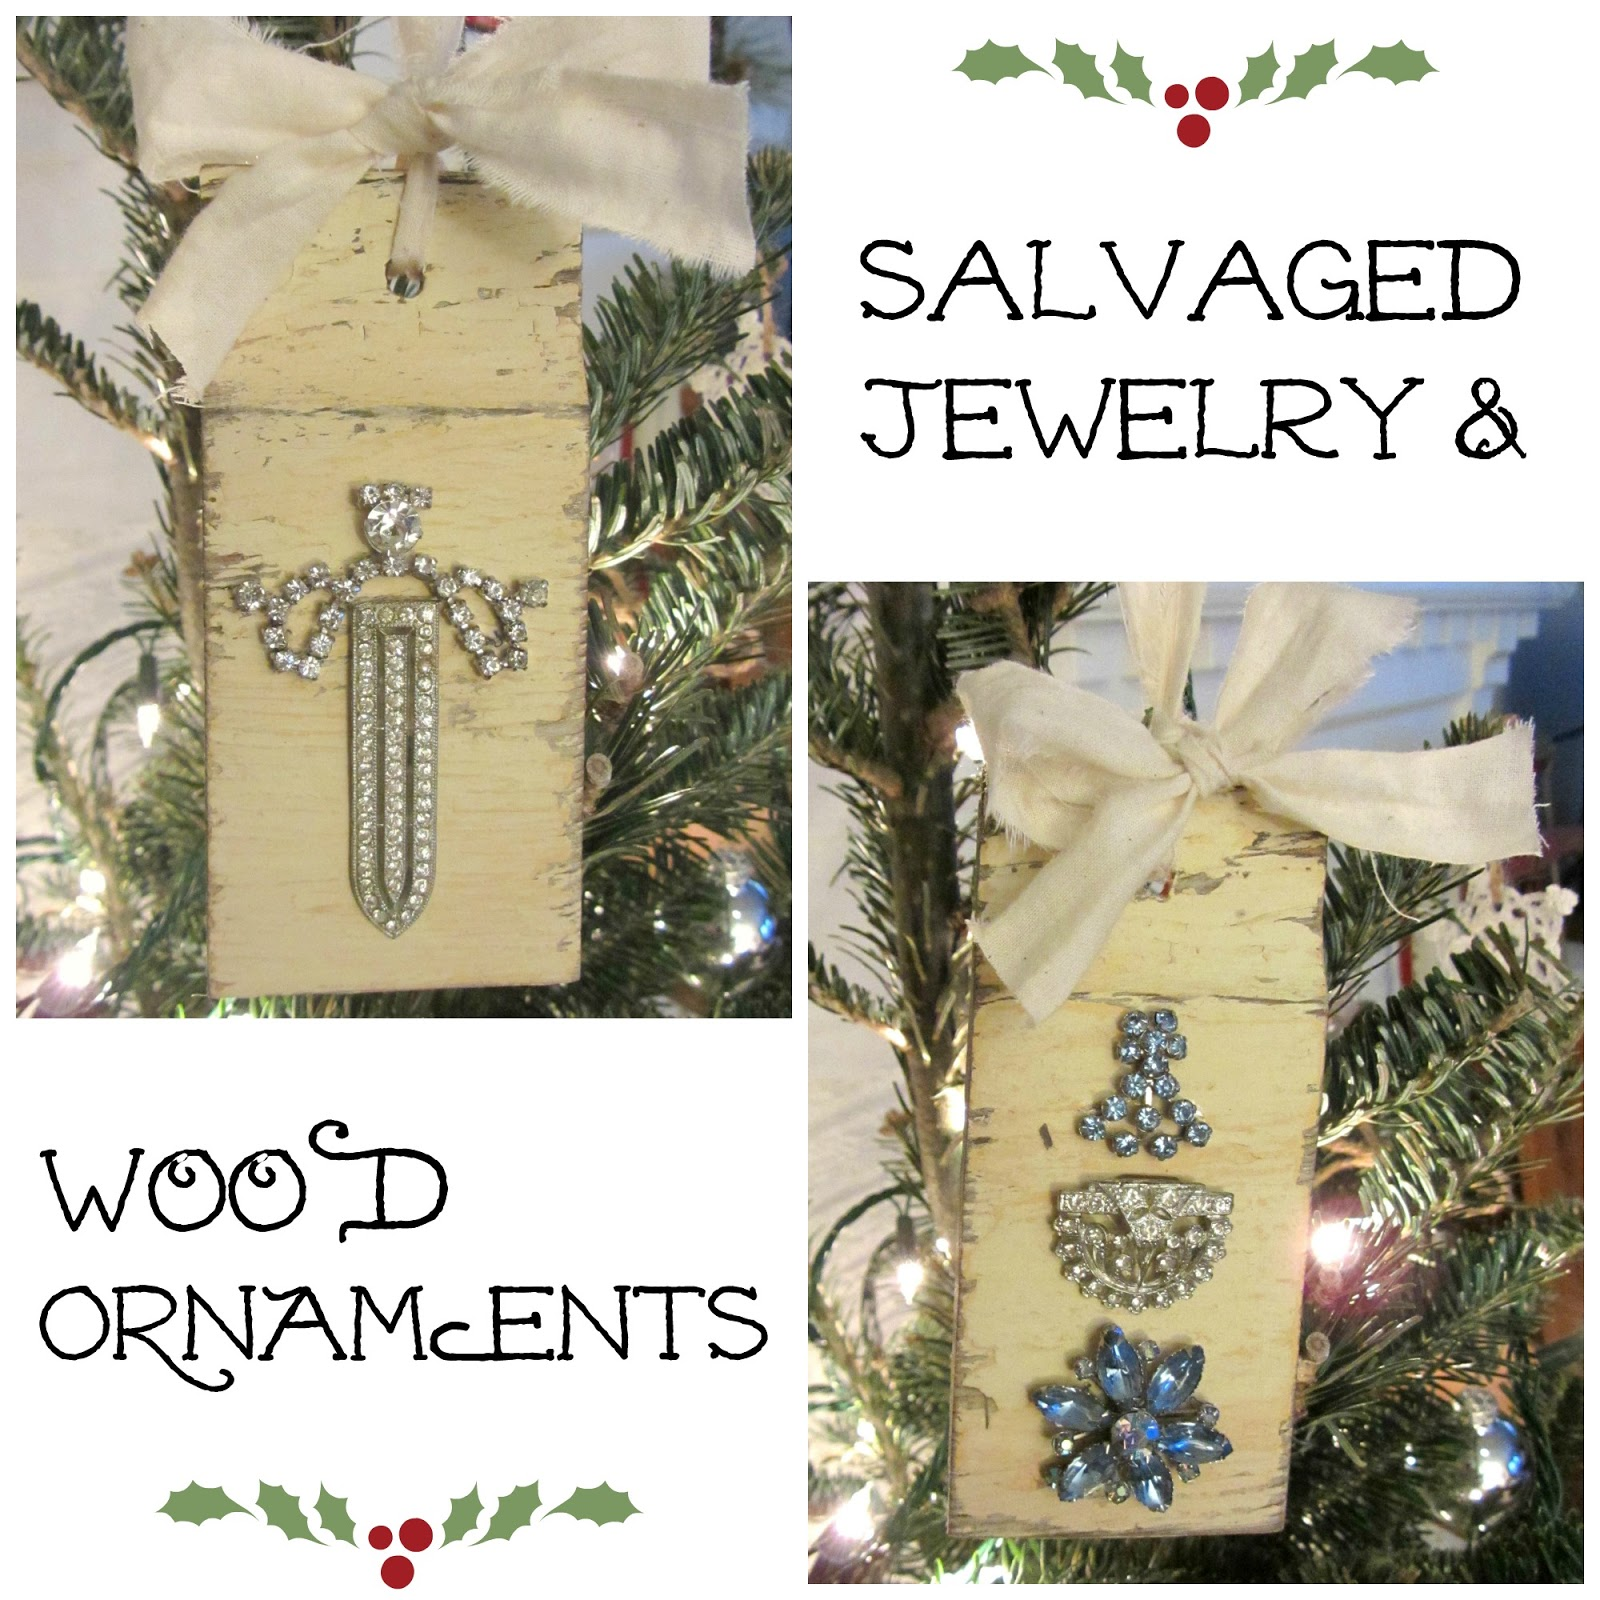 Vintage Jewelry & Salvaged Wood Ornaments www.organizedclutterqueen.blogspot.com